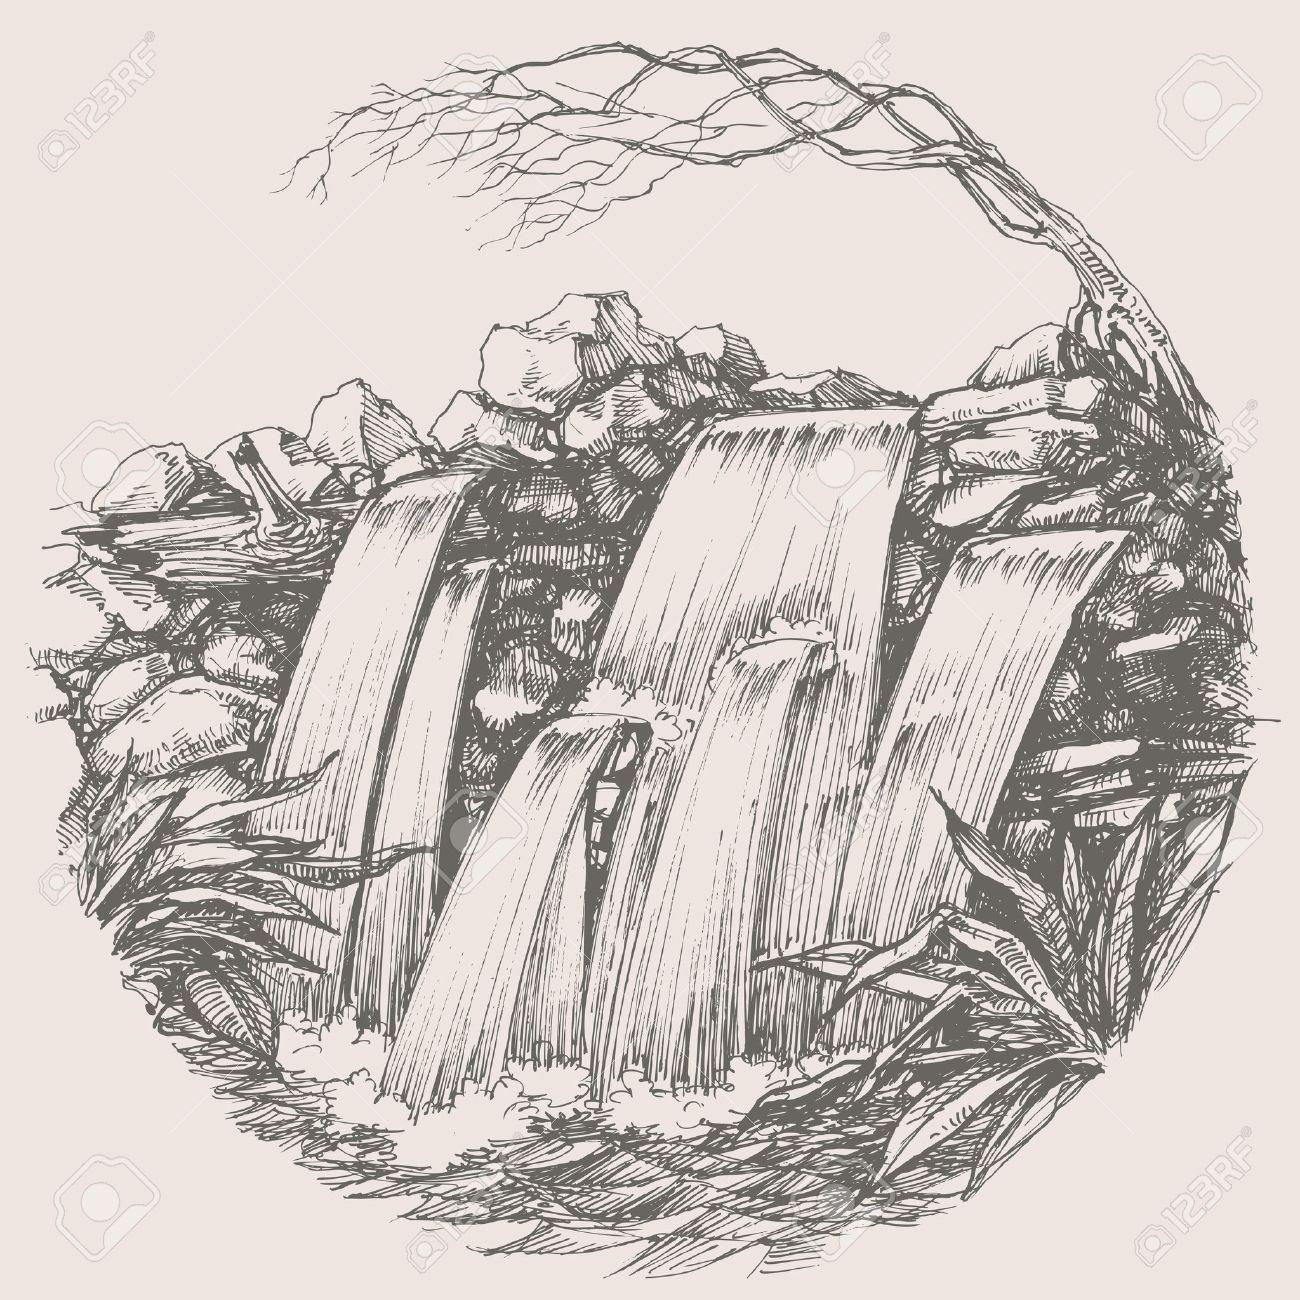 Waterfall round drawing - 43125003